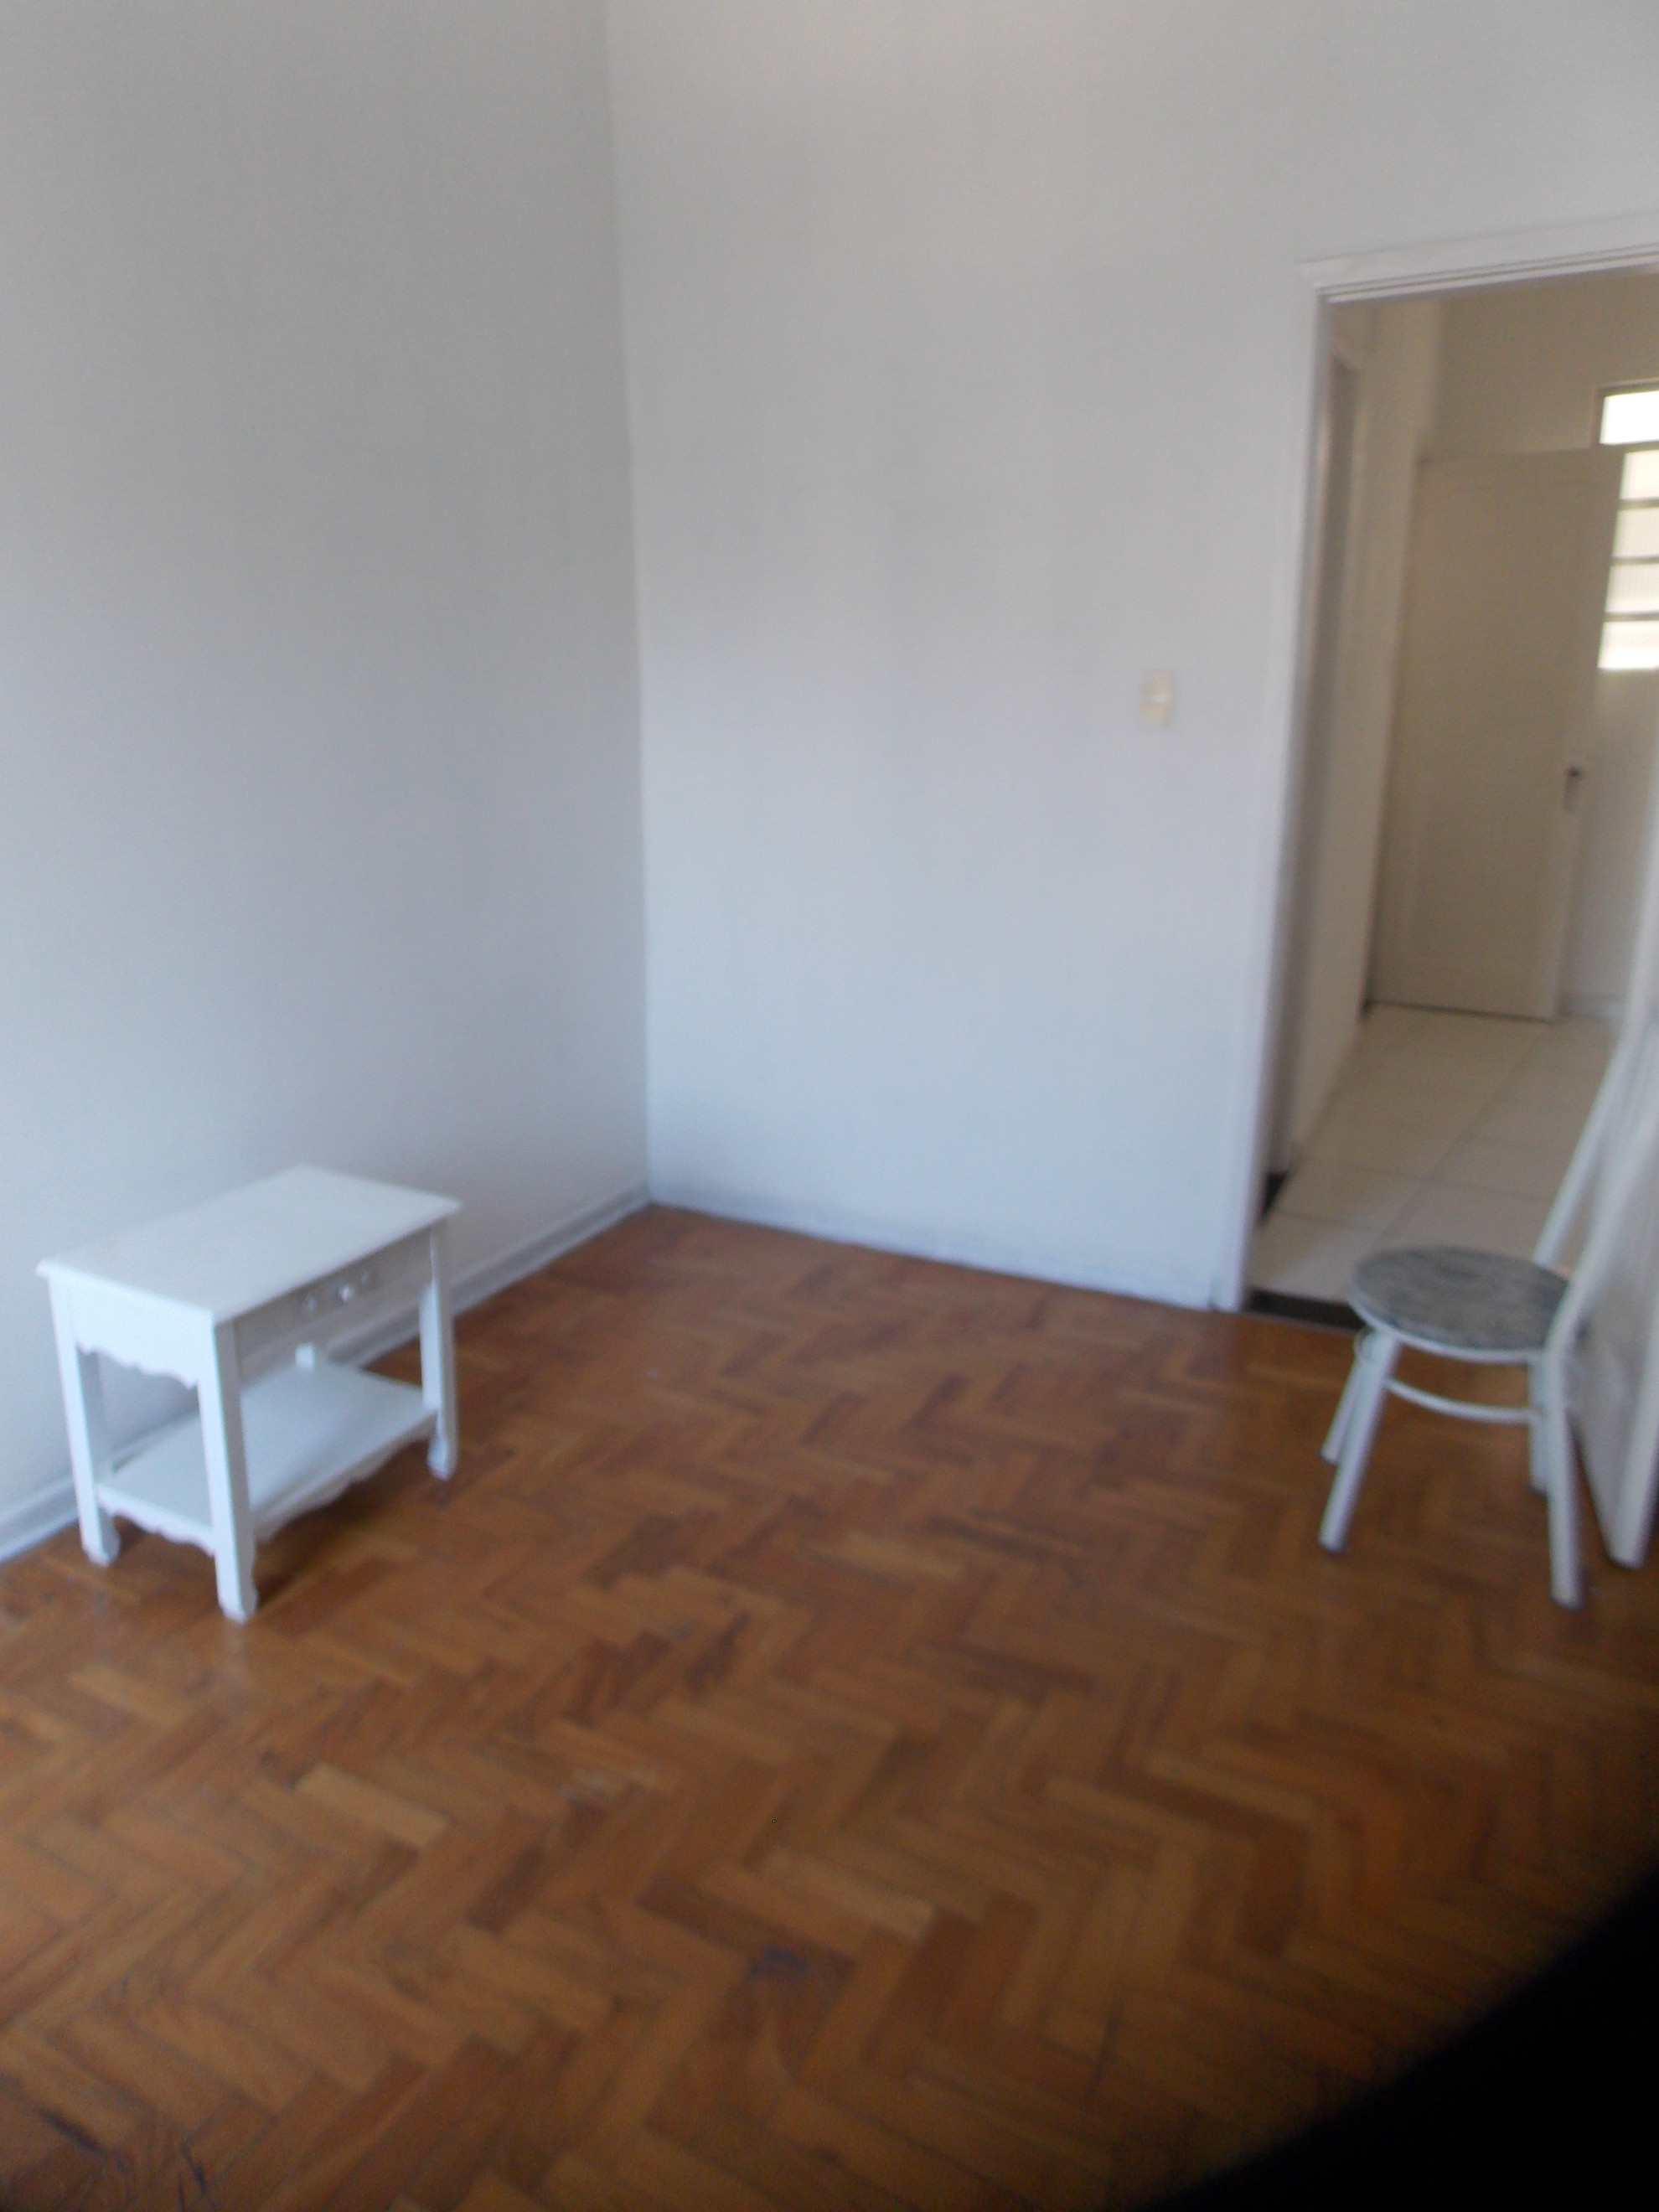 D - Dormitorio (5)